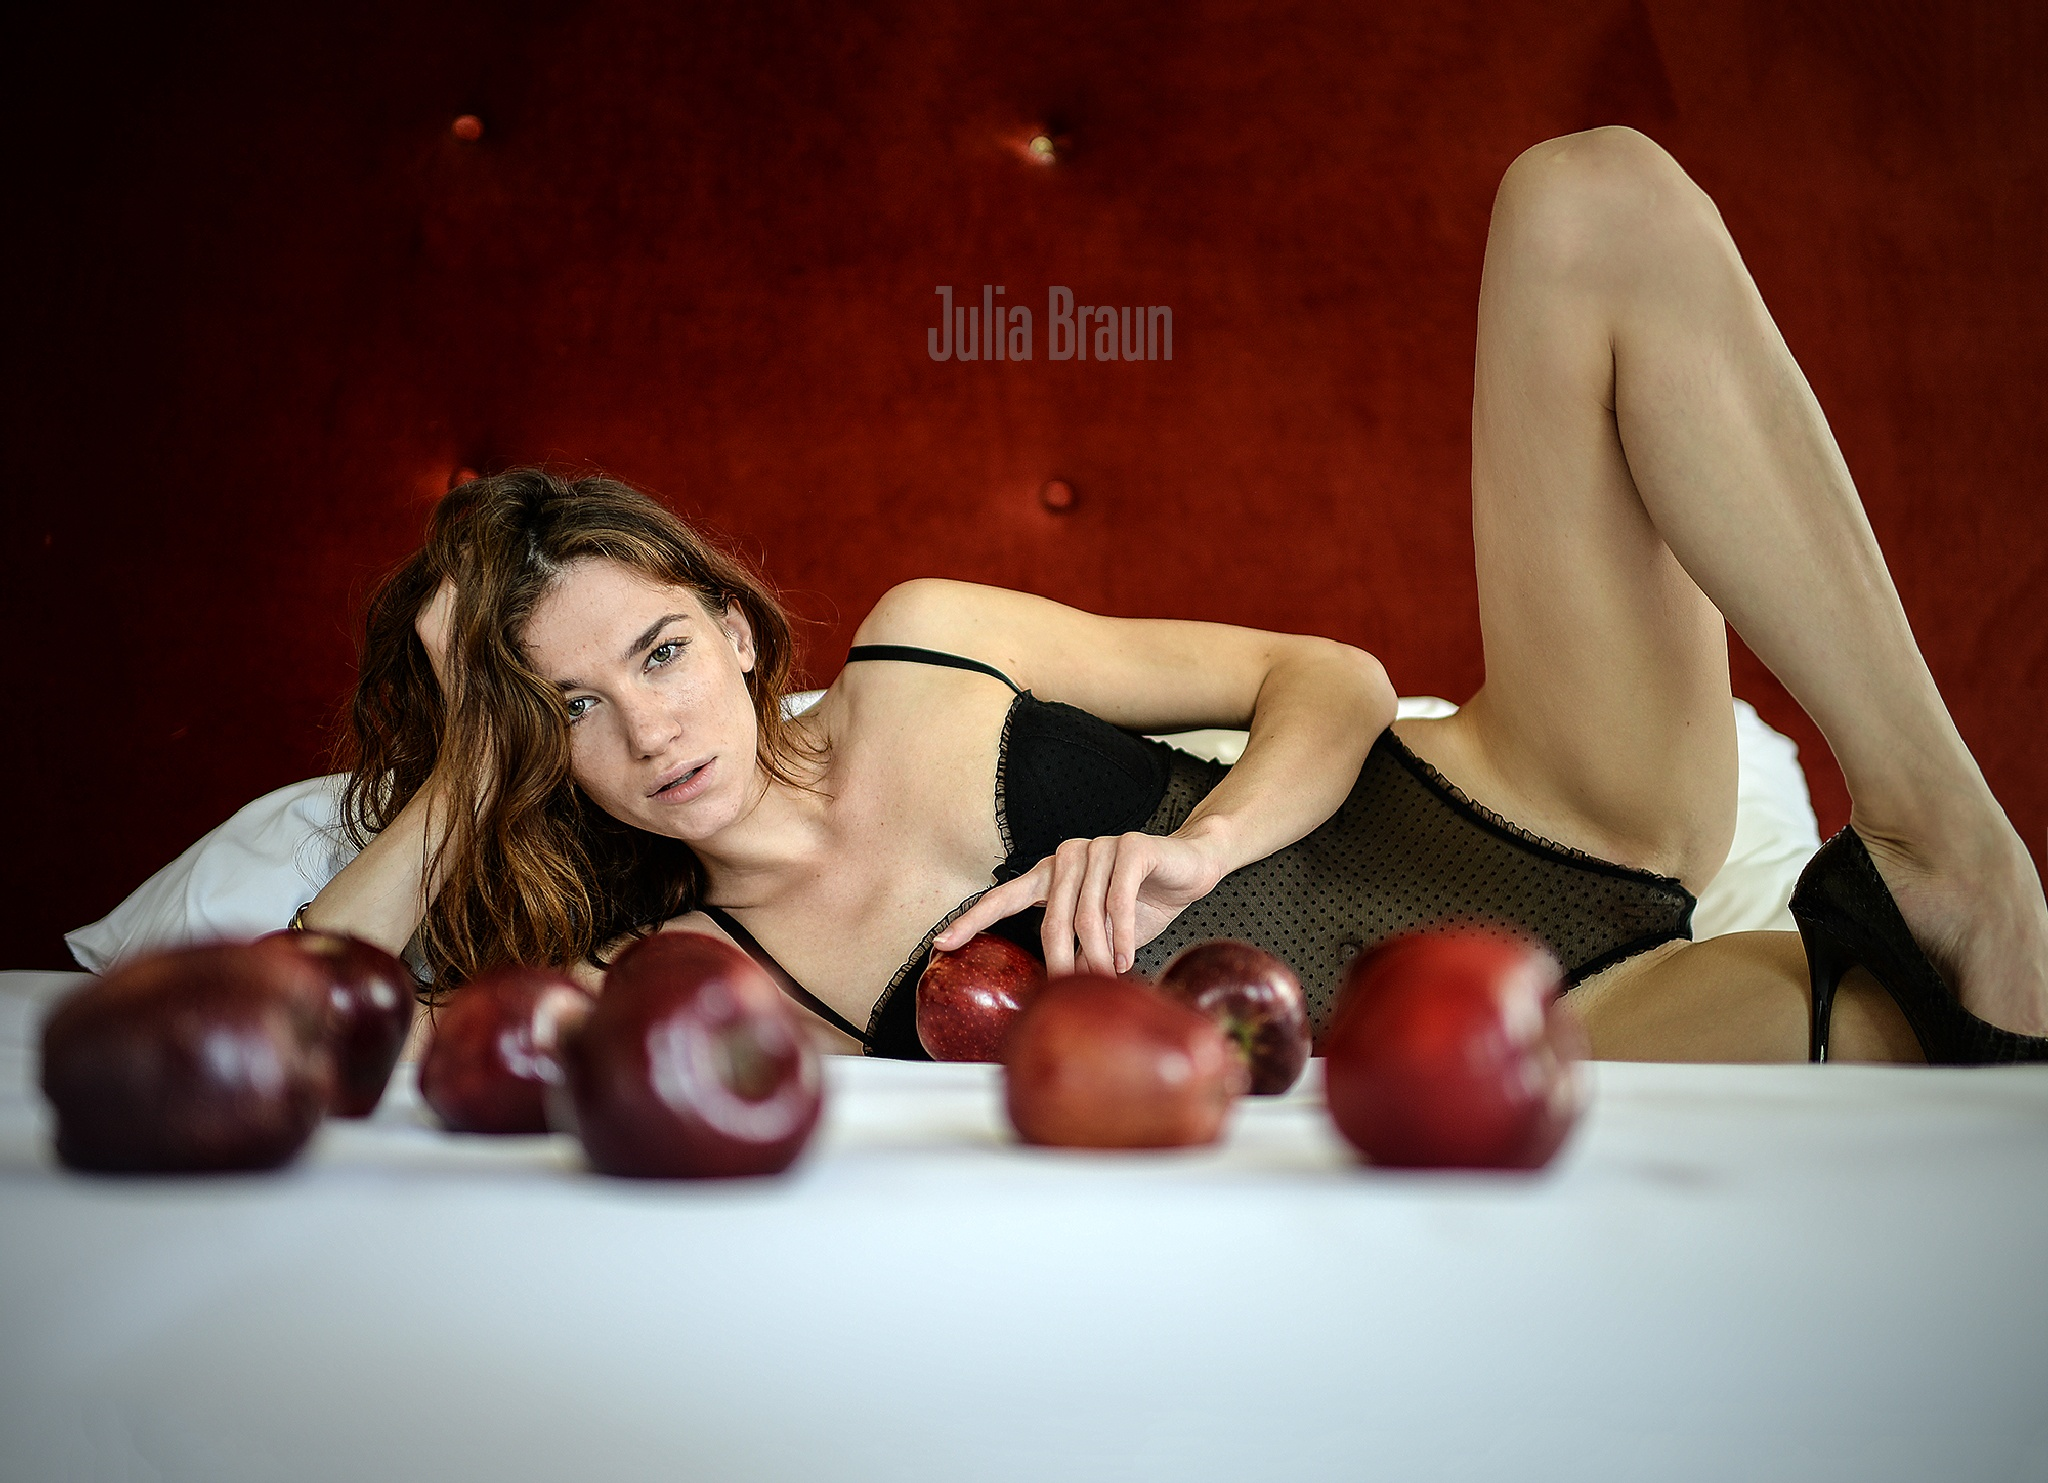 Red apples by JuliaBraun